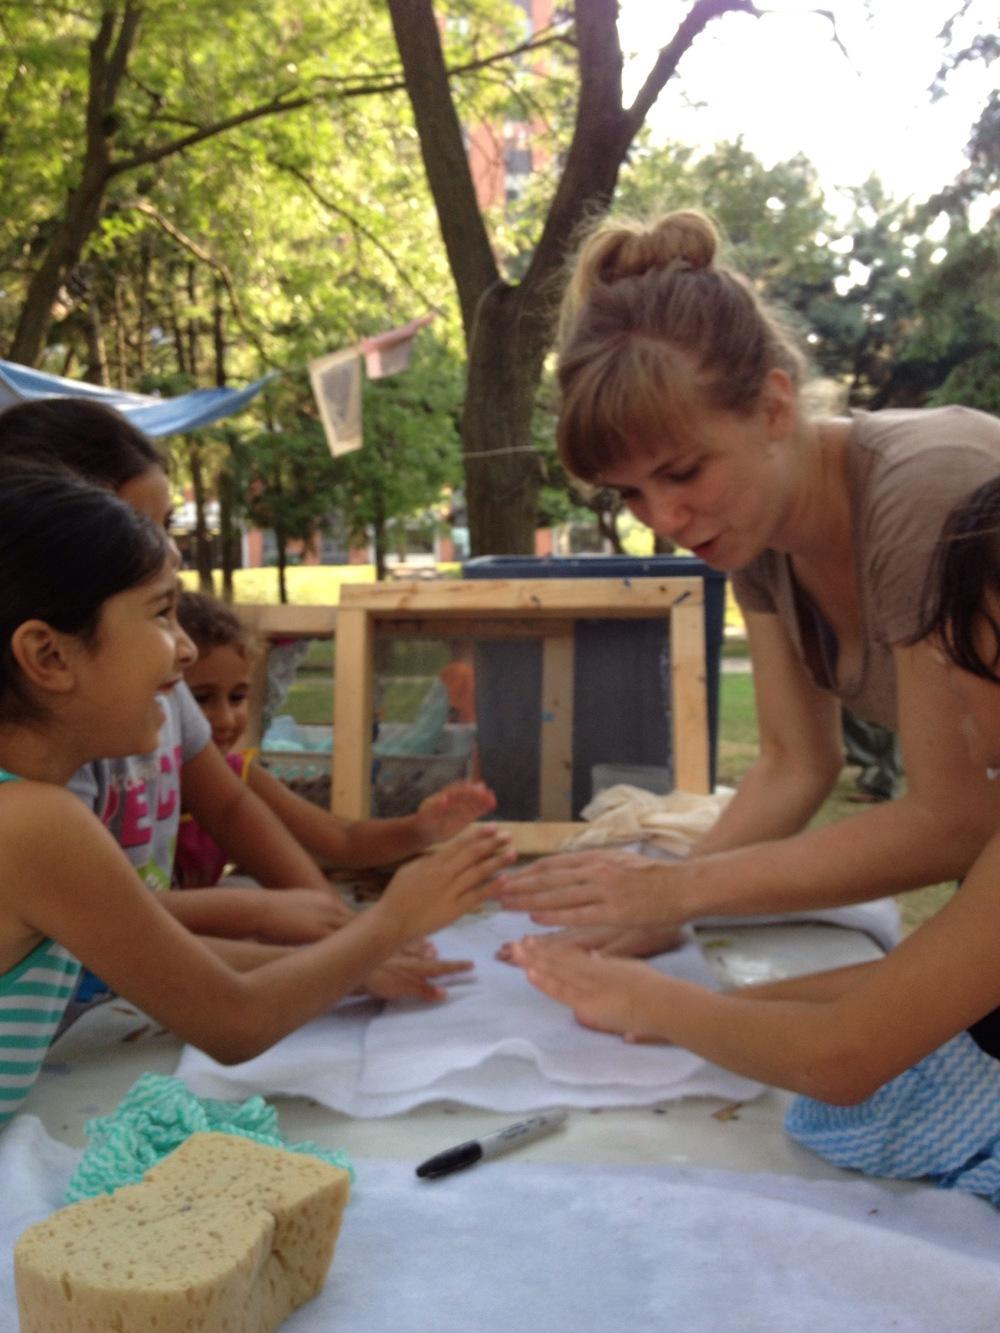 PARK_12_Paper Making_Sonja and girls.jpg